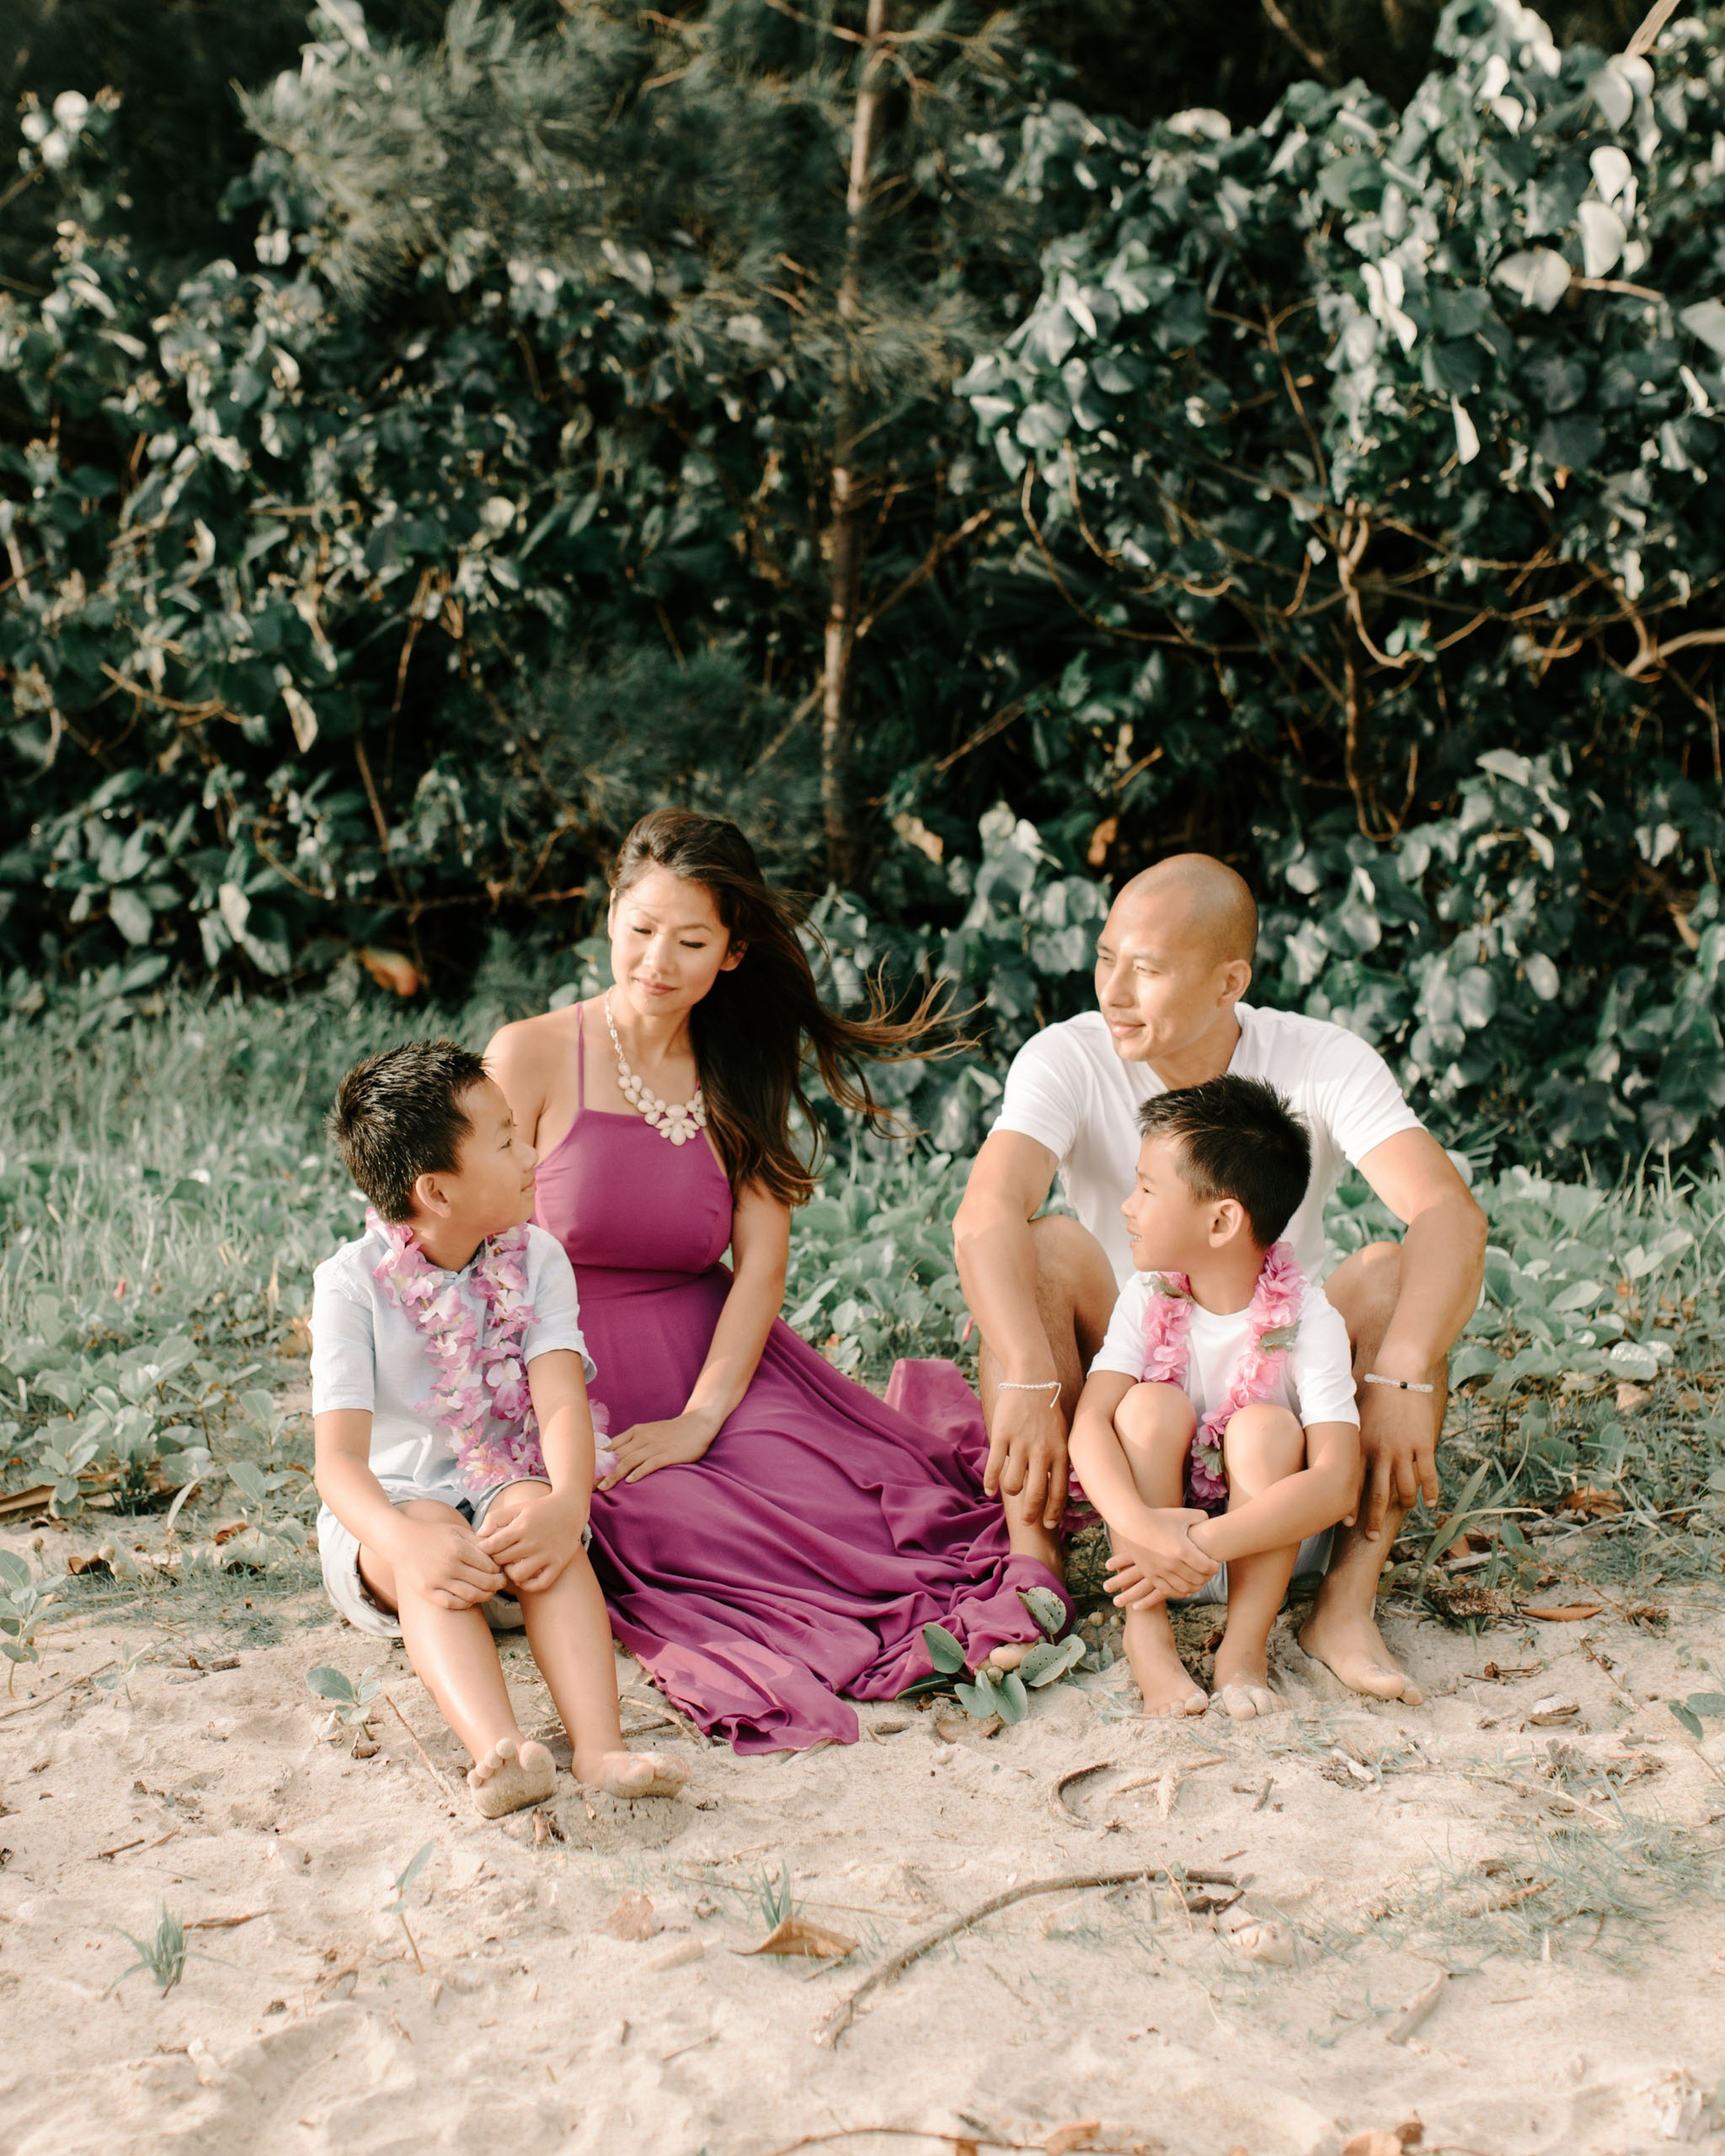 Beautiful Kahana Bay Sunrise Family Photos By Oahu Family Photographer Desiree Leilani